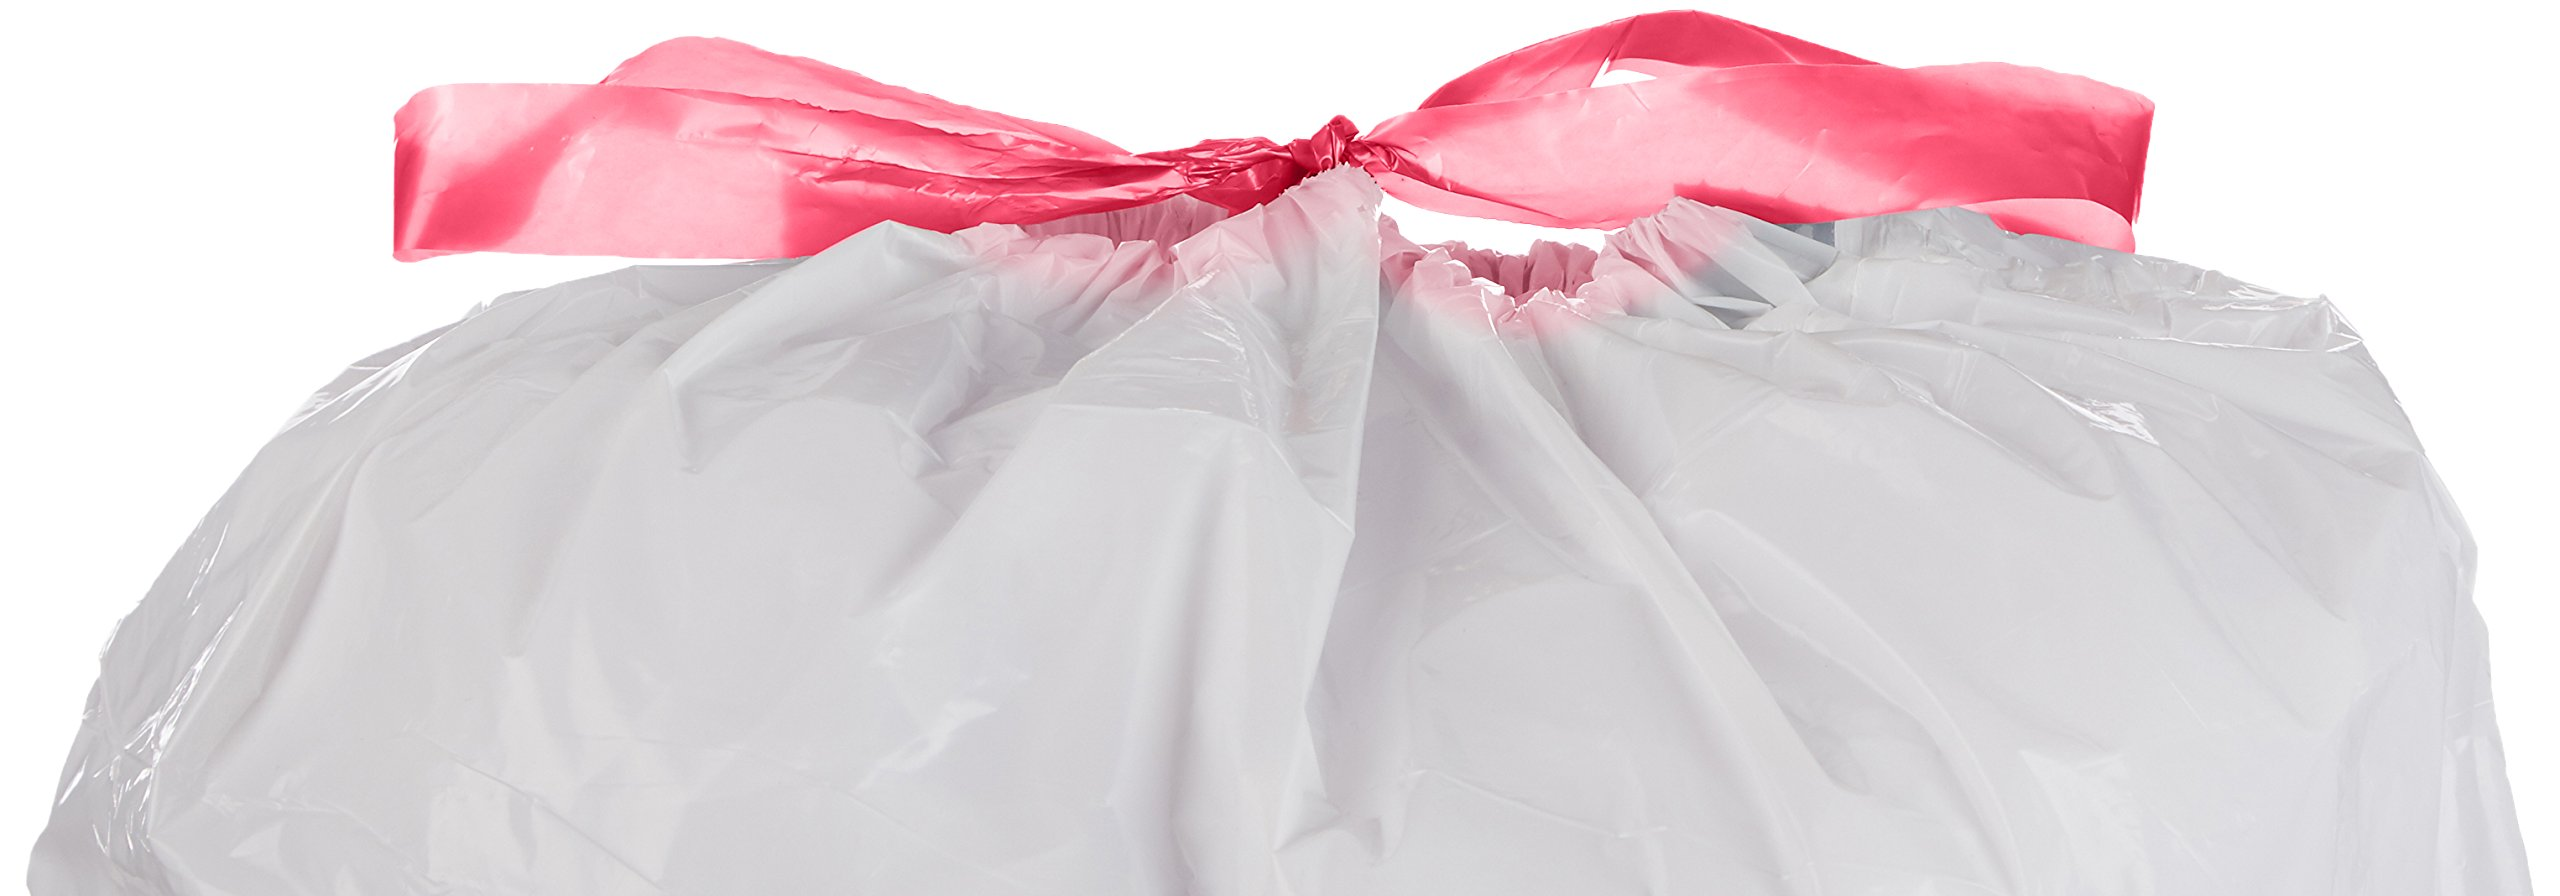 AmazonBasics 12-16 Gallon Tall Kitchen Trash Bag with Draw String ...